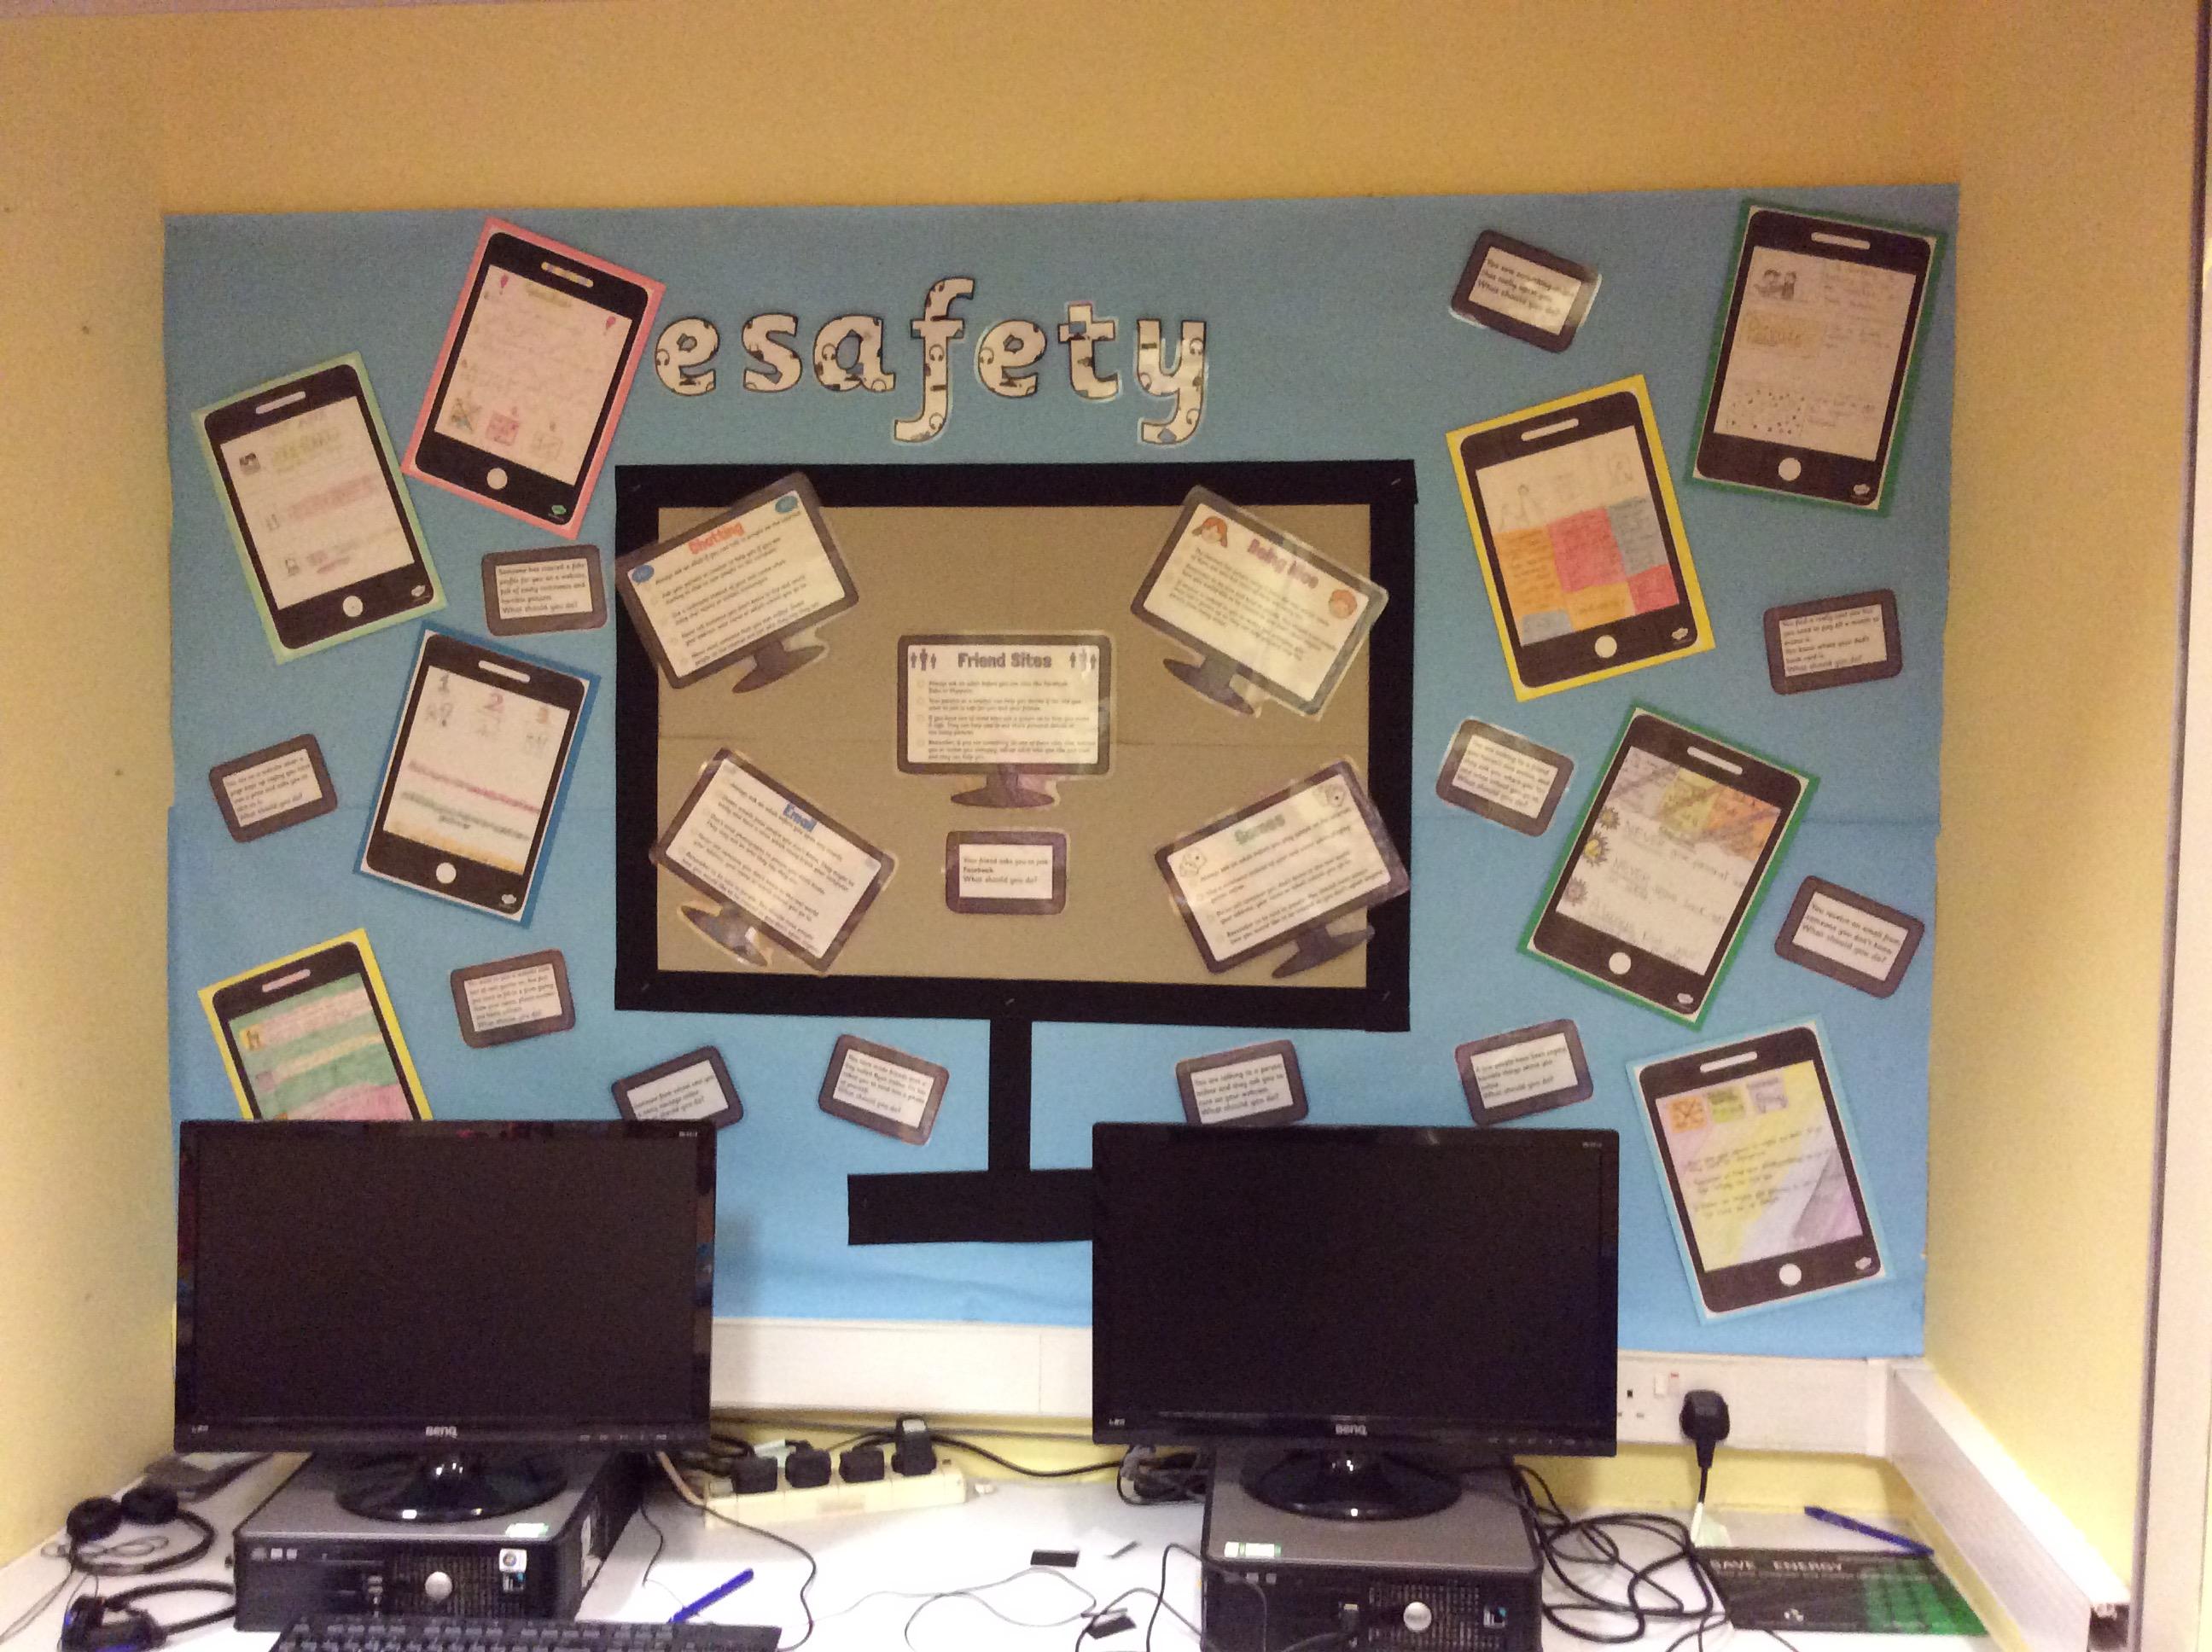 Ict Classroom Ideas ~ Display ideas esafety alittlebutalot